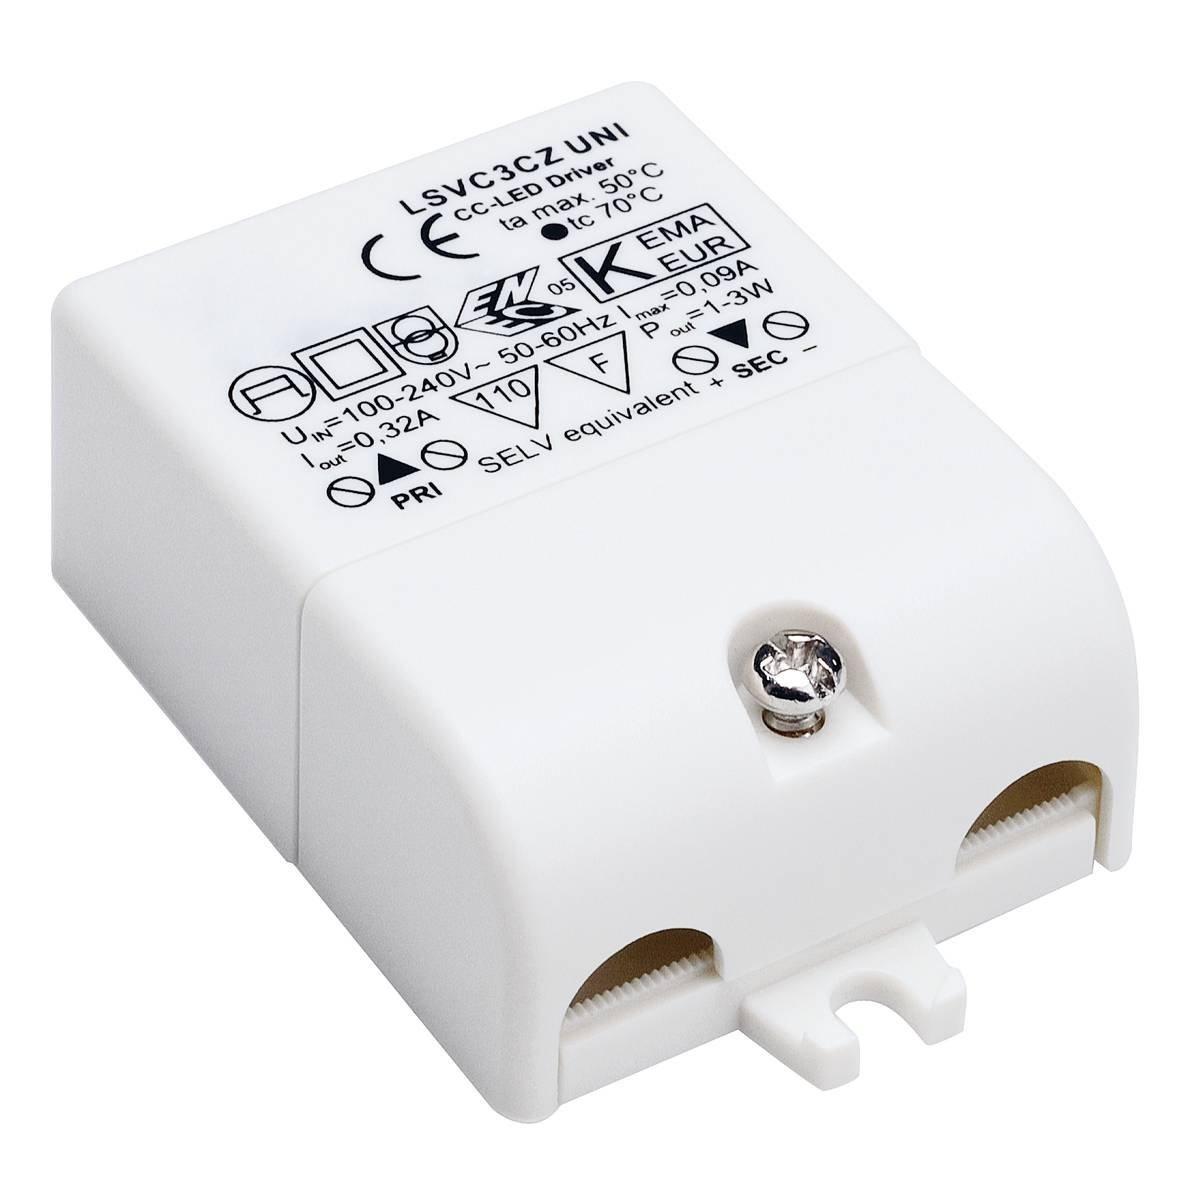 SLV – verlichting Led Driver – 3W – 350mA 464108 | 4024163102179